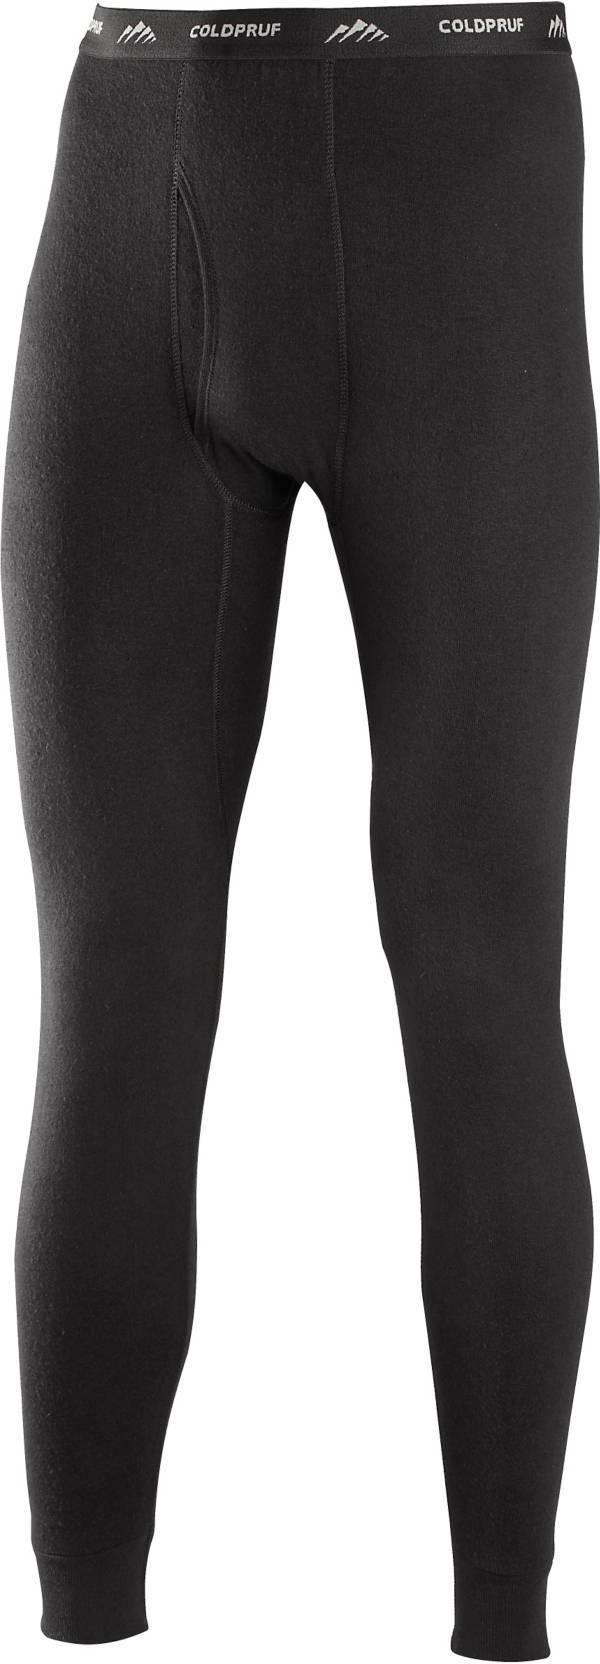 ColdPruf Men's Basic Base Layer Leggings (Regular and Big & Tall) product image